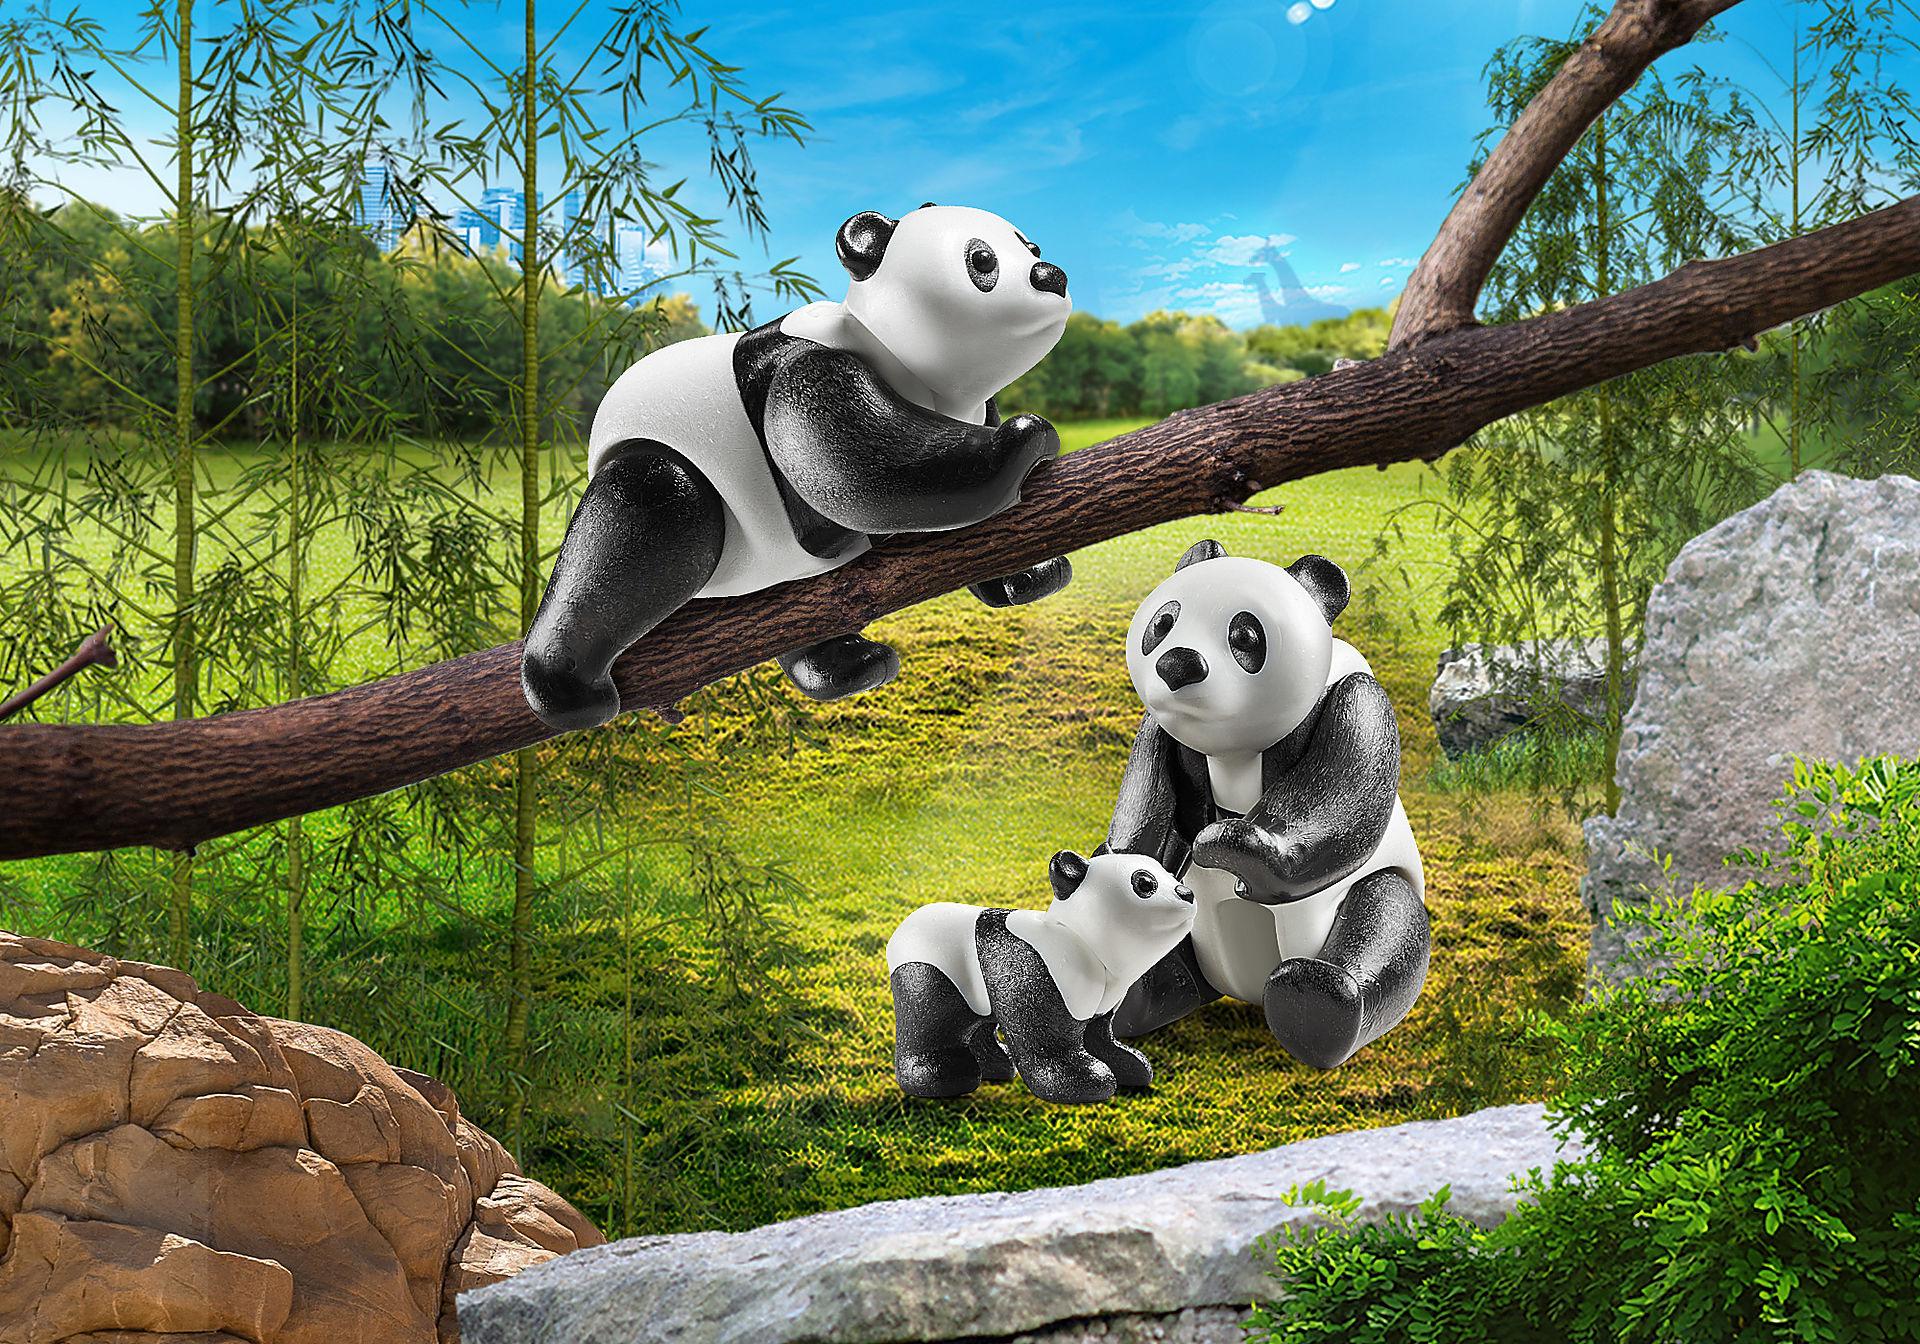 70353 2 Panda's met baby zoom image1